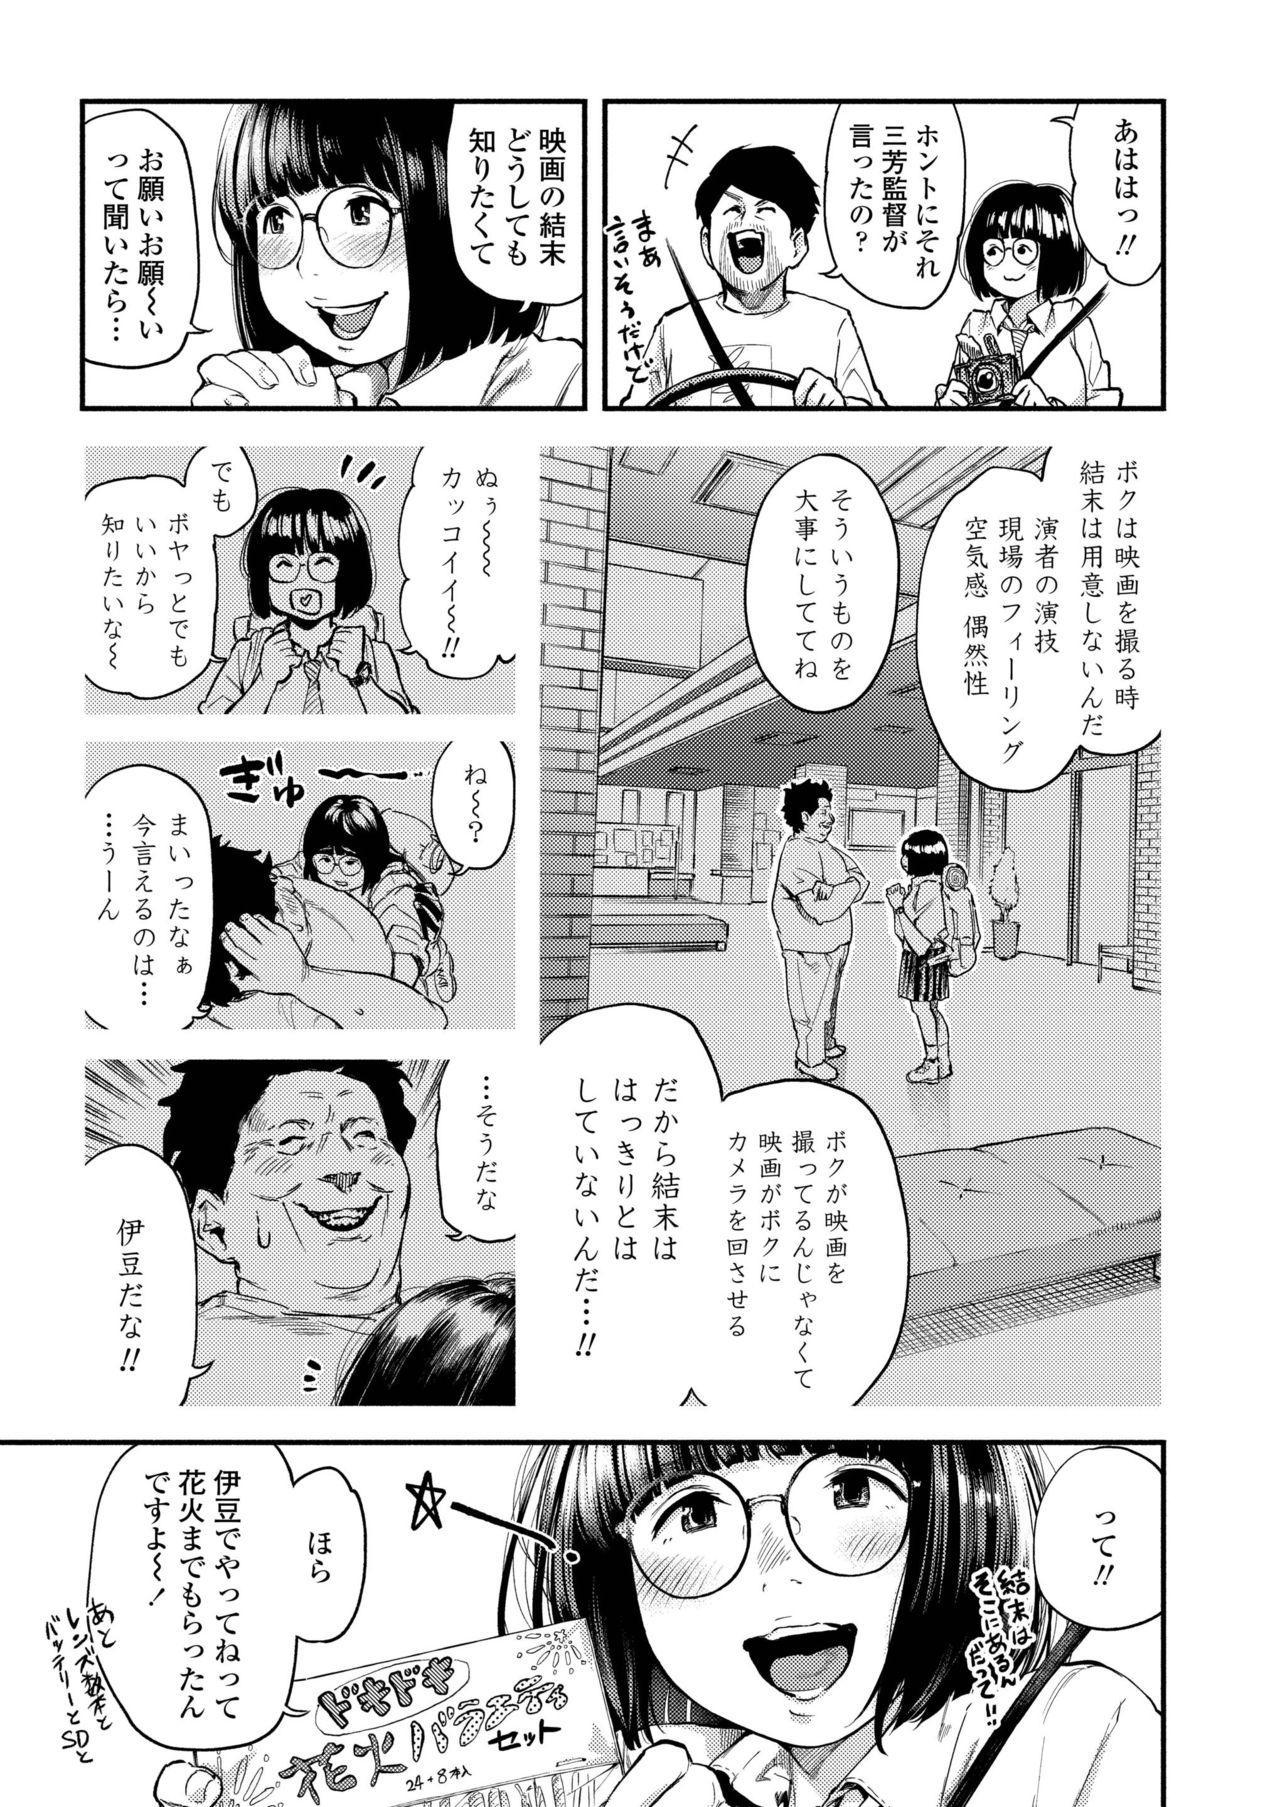 COMIC AOHA 2019 Haru 276